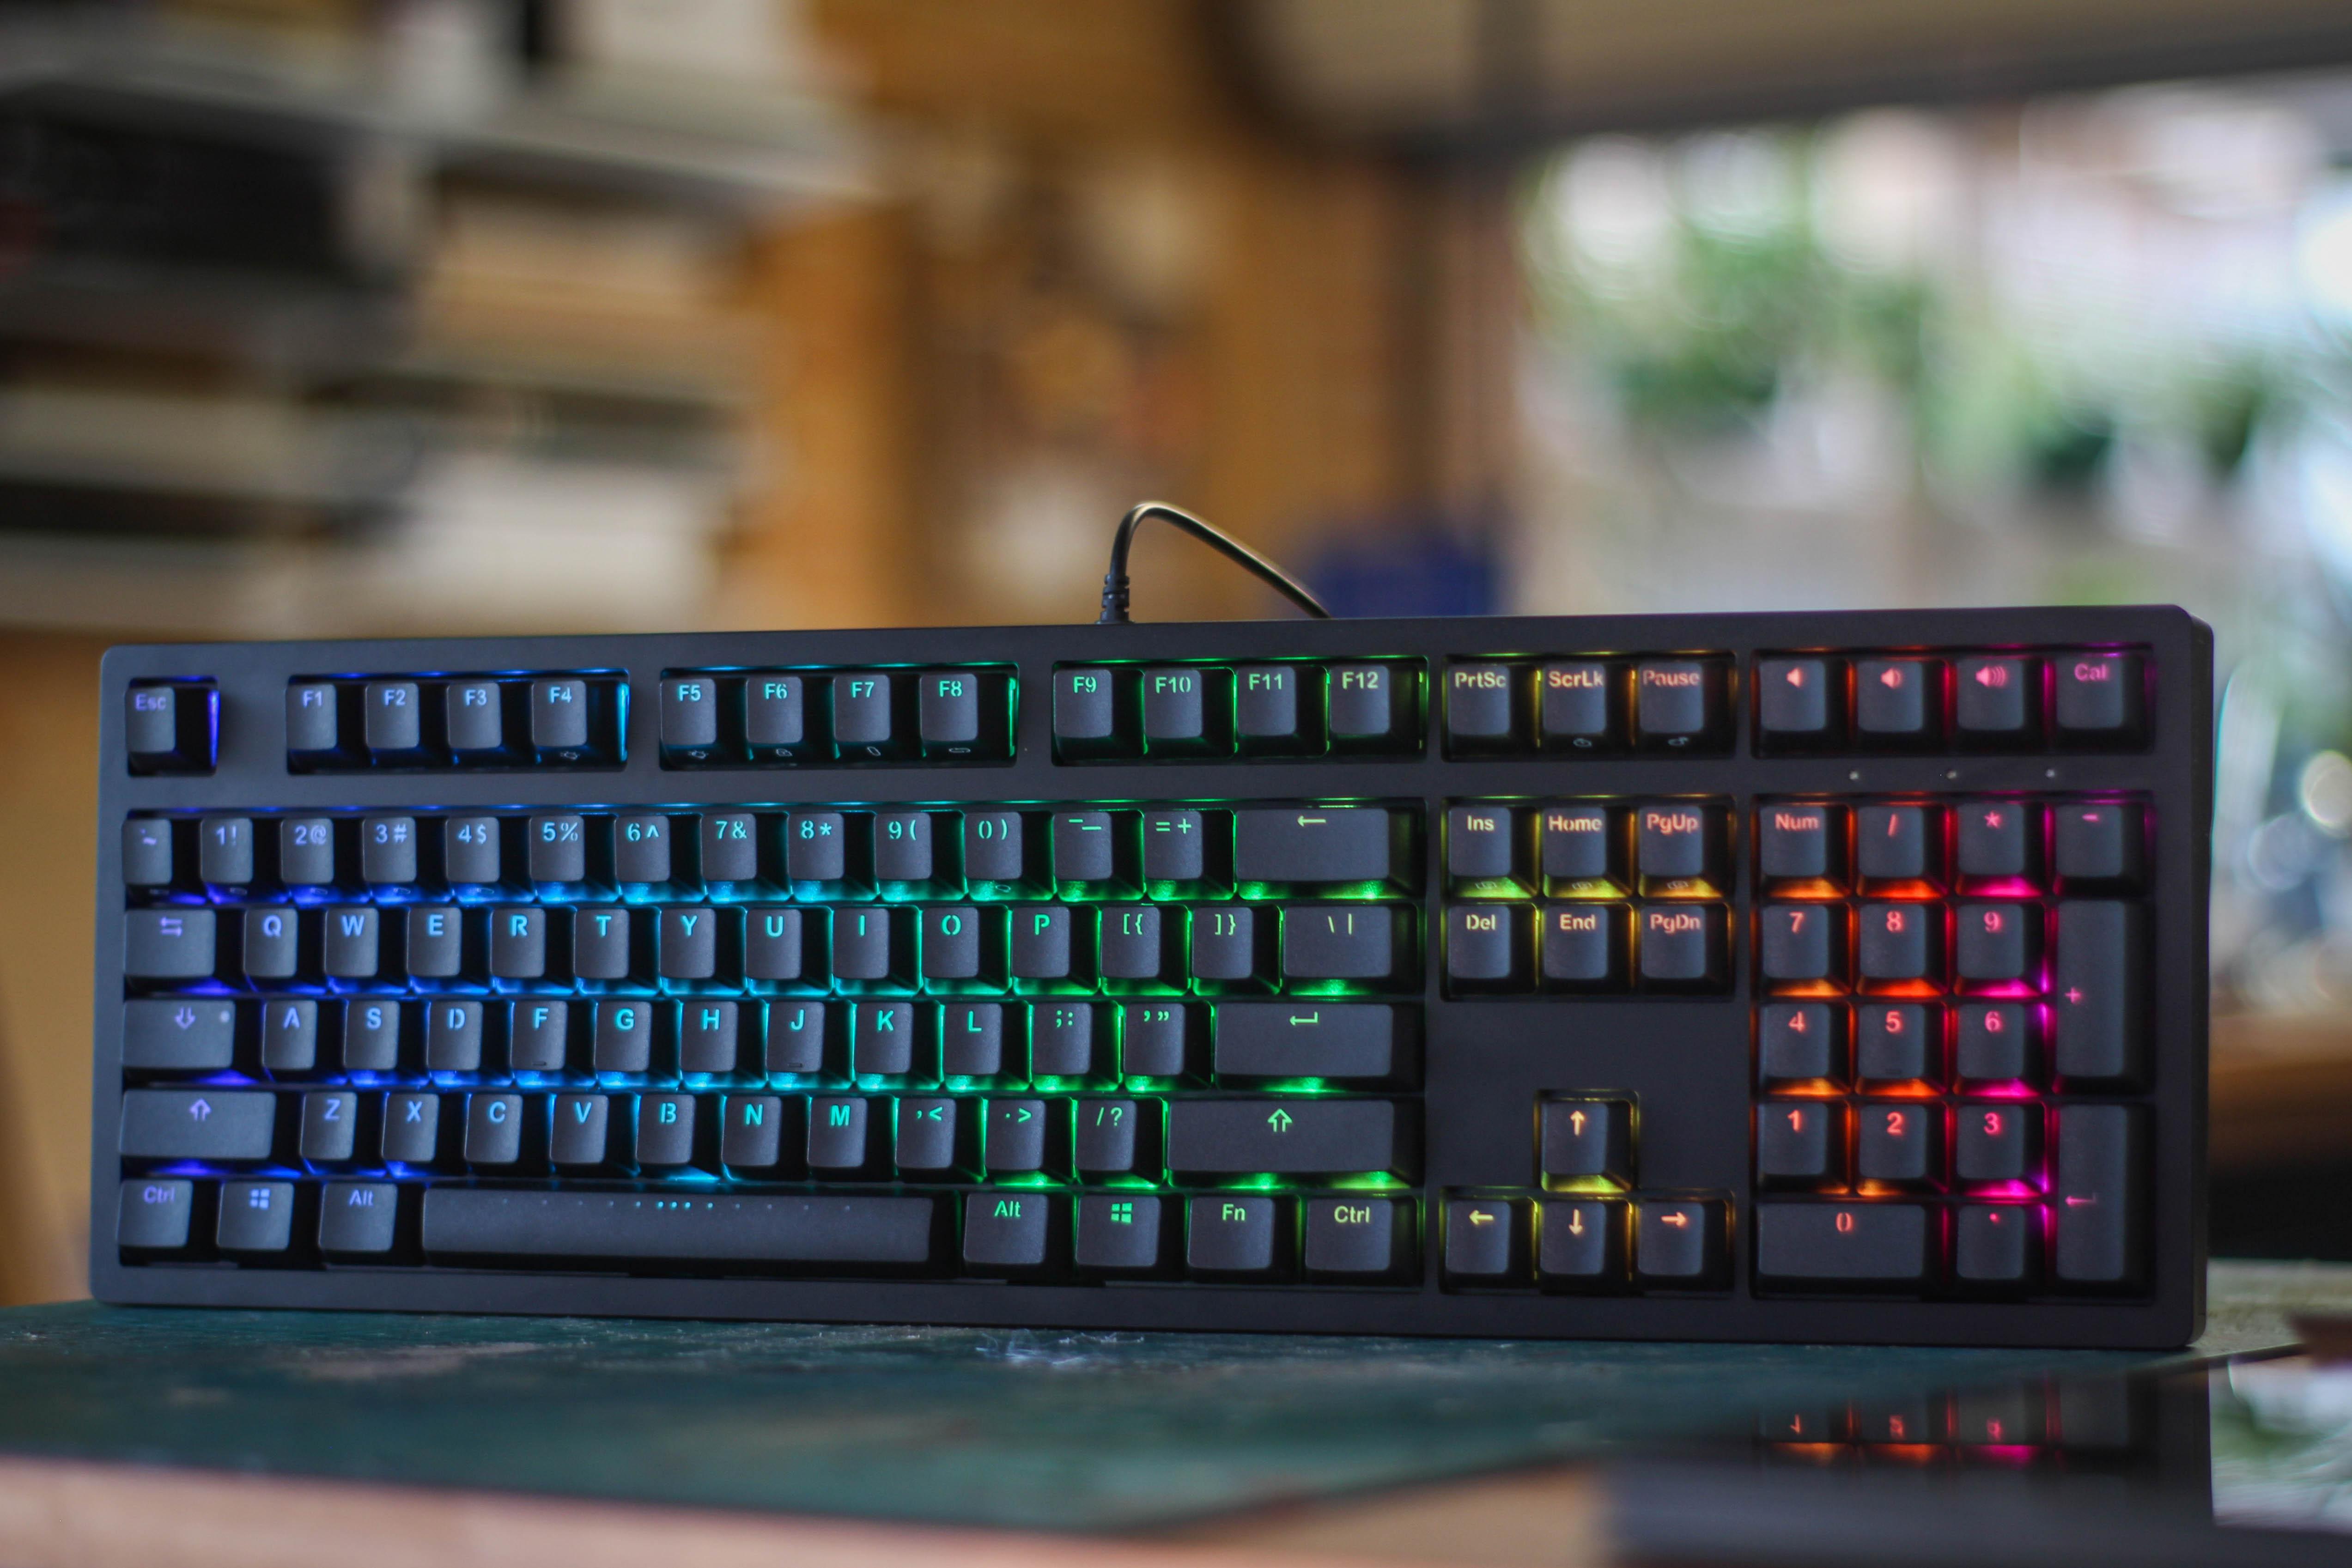 REVIEW : IKBC MF108 Full Metal Mechanical Keyboard